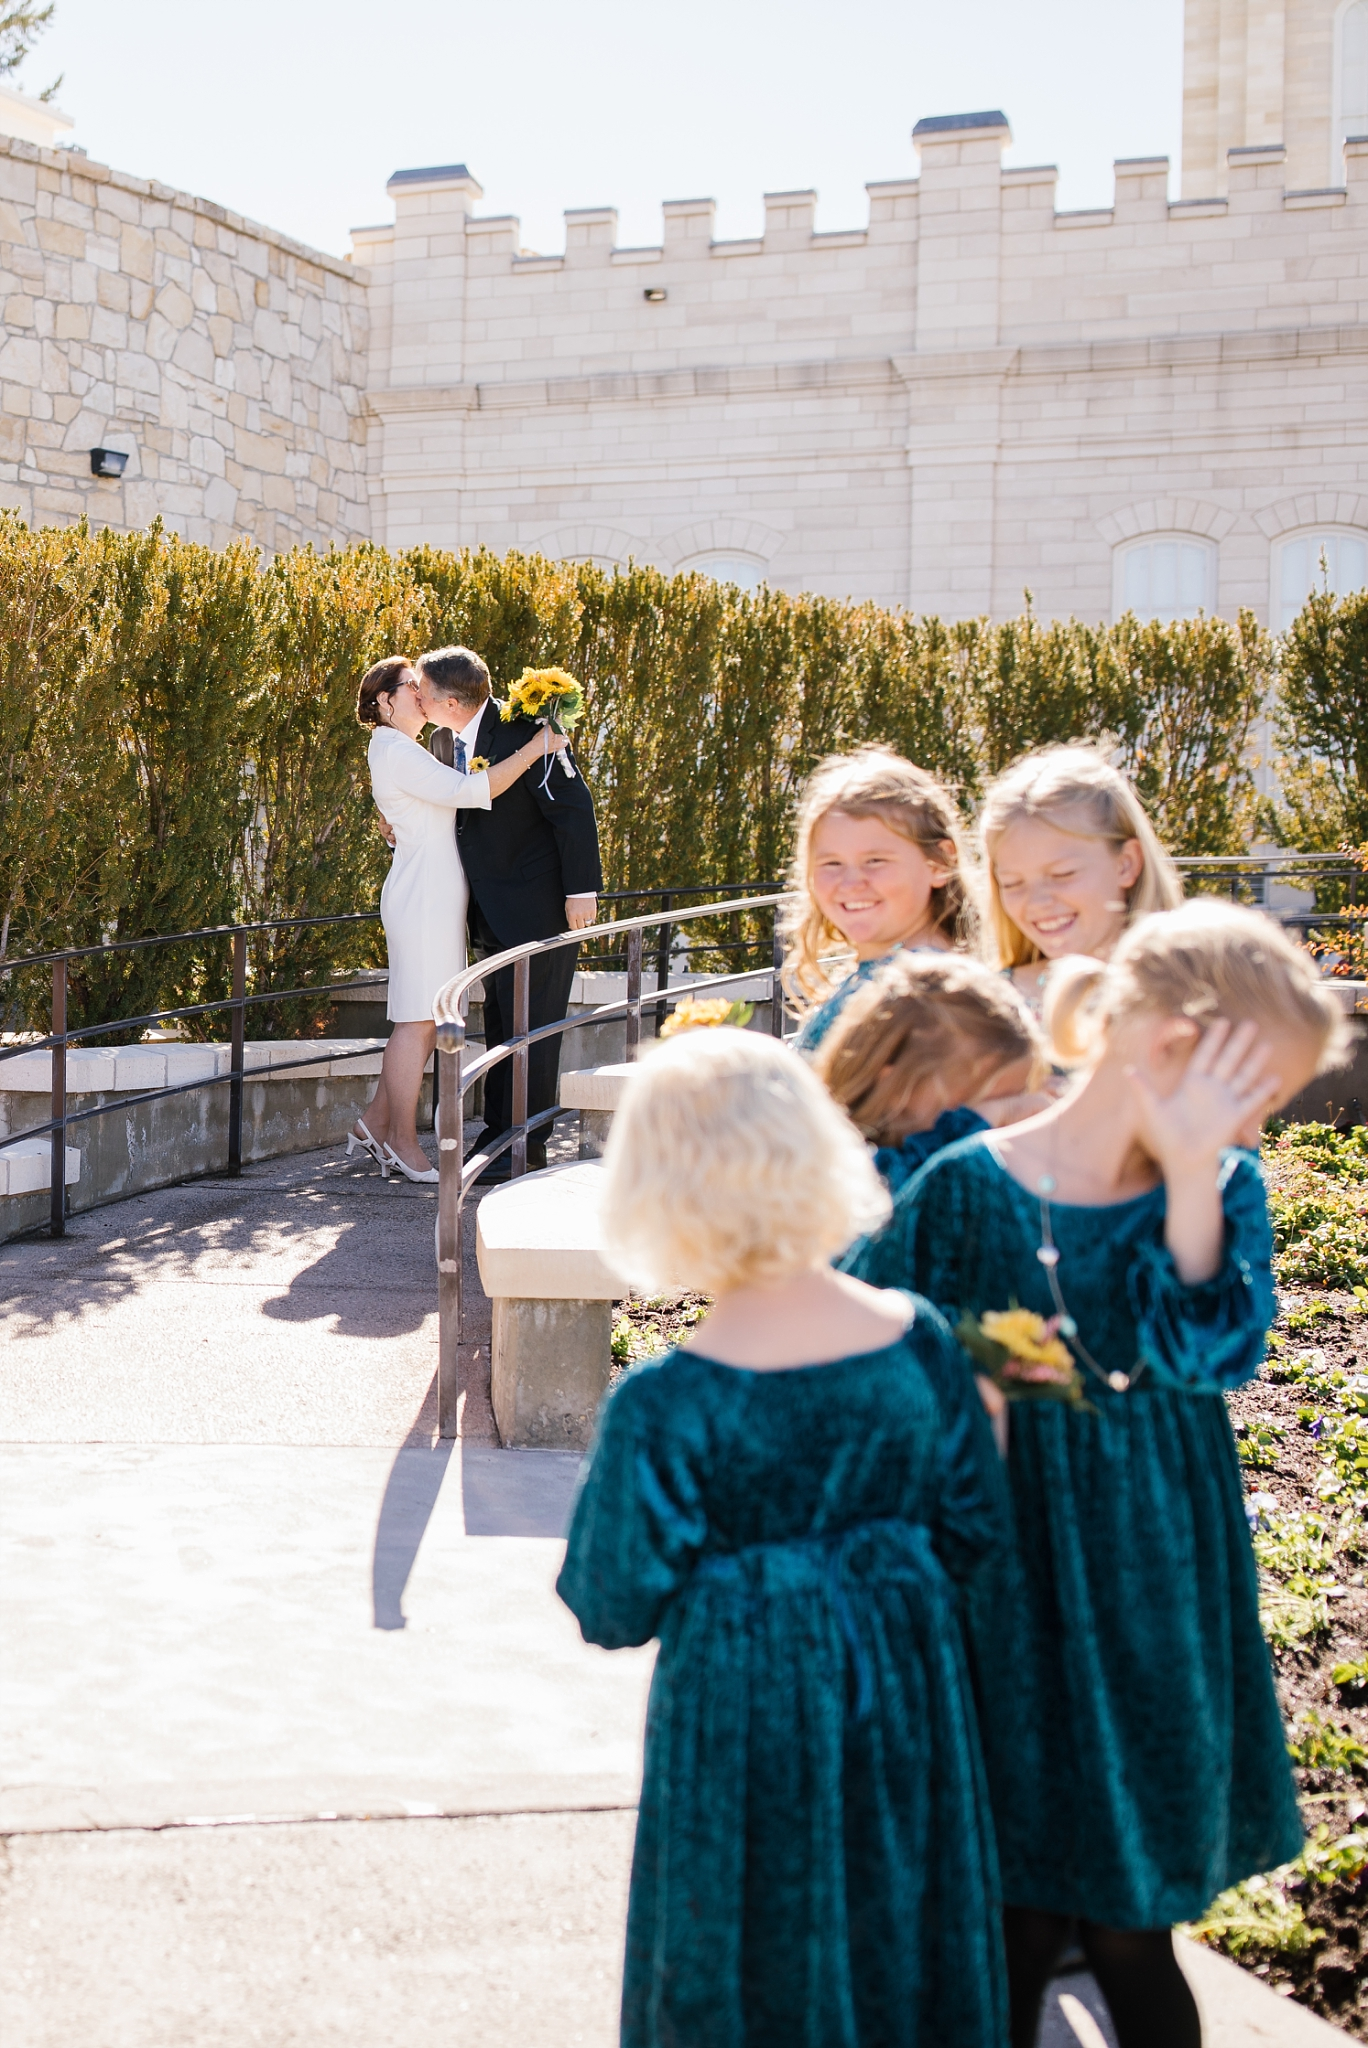 PDWeddingDay-8_Lizzie-B-Imagery-Utah-Wedding-Photographer-Park-City-Salt-Lake-City-Manti-Utah-Temple.jpg